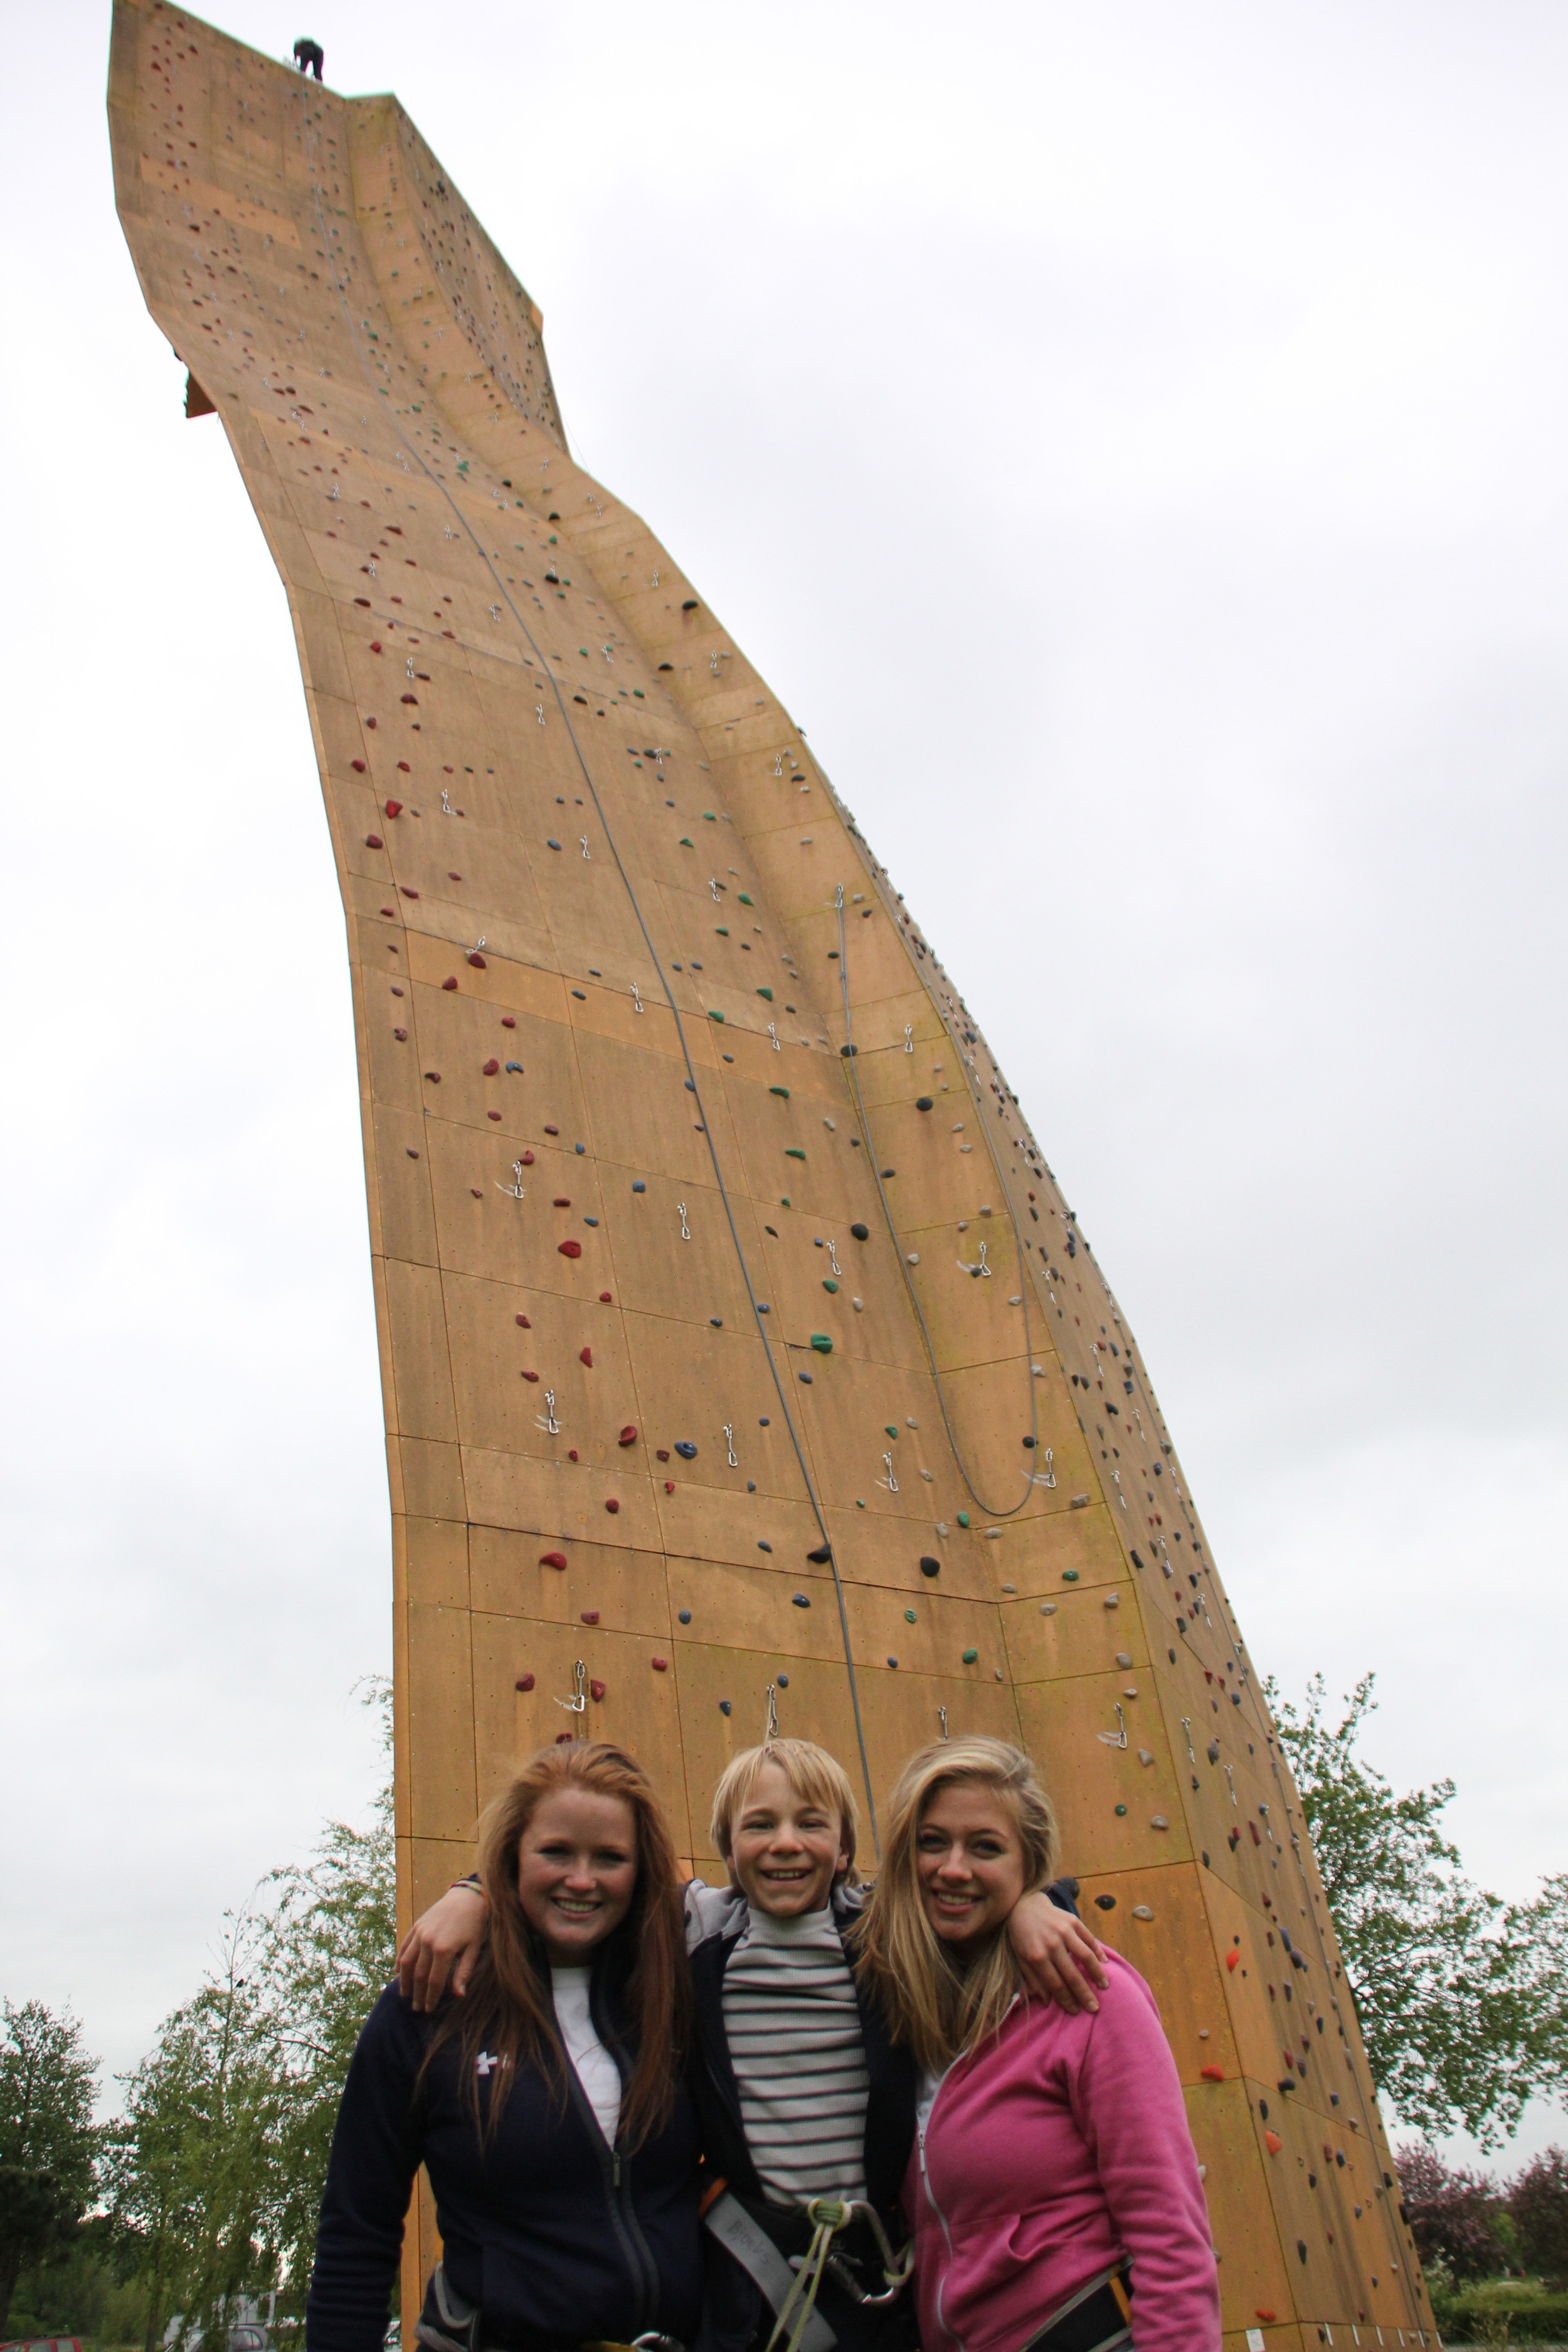 Triumphant climbers!